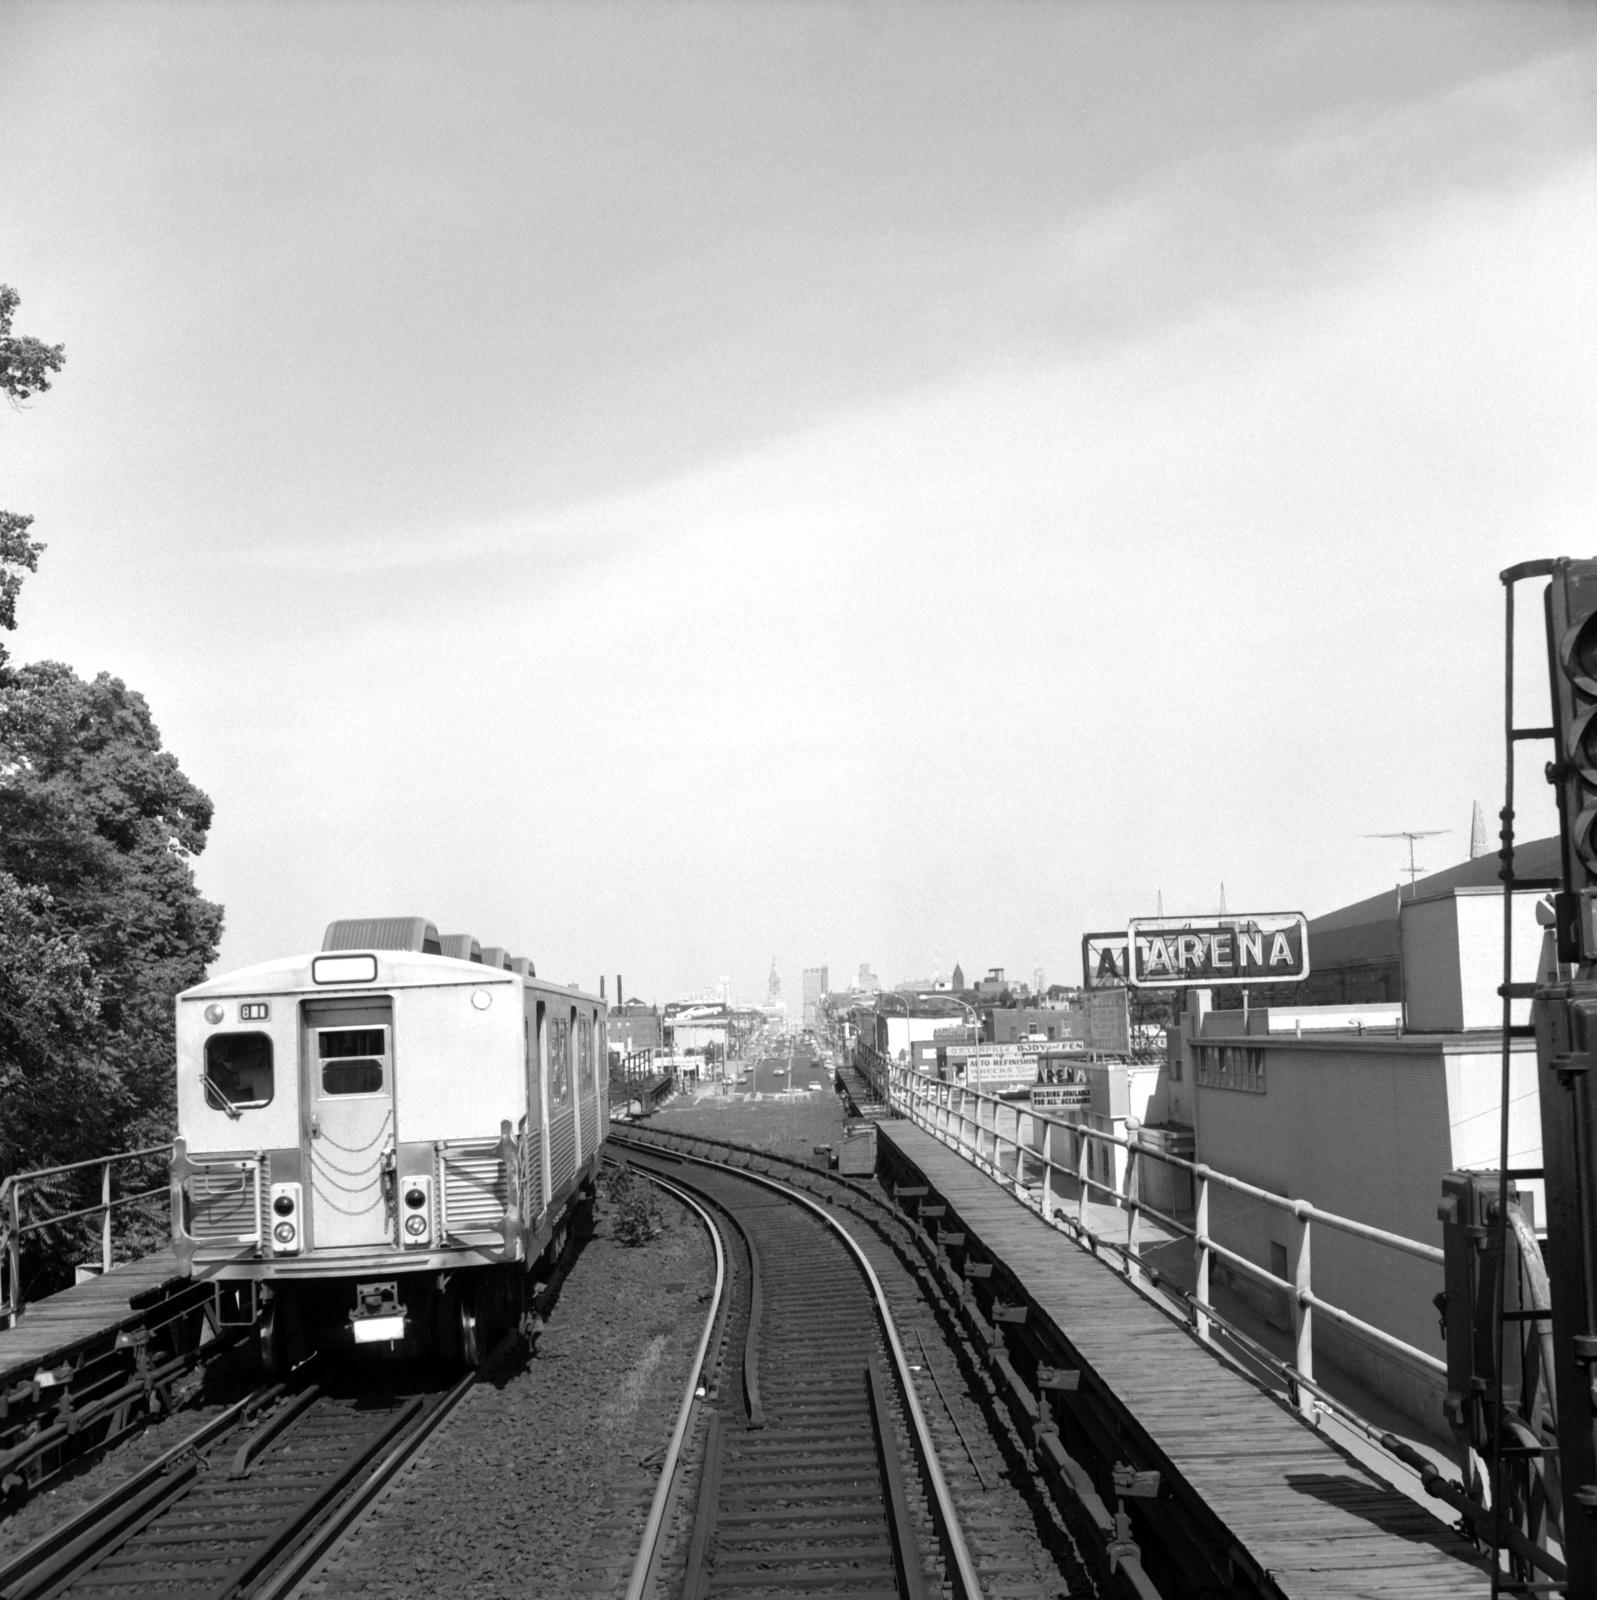 (680k, 1597x1600)<br><b>Country:</b> United States<br><b>City:</b> Philadelphia, PA<br><b>System:</b> SEPTA (or Predecessor)<br><b>Line:</b> Market-Frankford El<br><b>Location:</b> 46th Street<br><b>Car:</b> SEPTA M-3 (Budd, 1960)  <br><b>Collection of:</b> David Pirmann<br><b>Date:</b> 6/12/1965<br><b>Viewed (this week/total):</b> 4 / 128